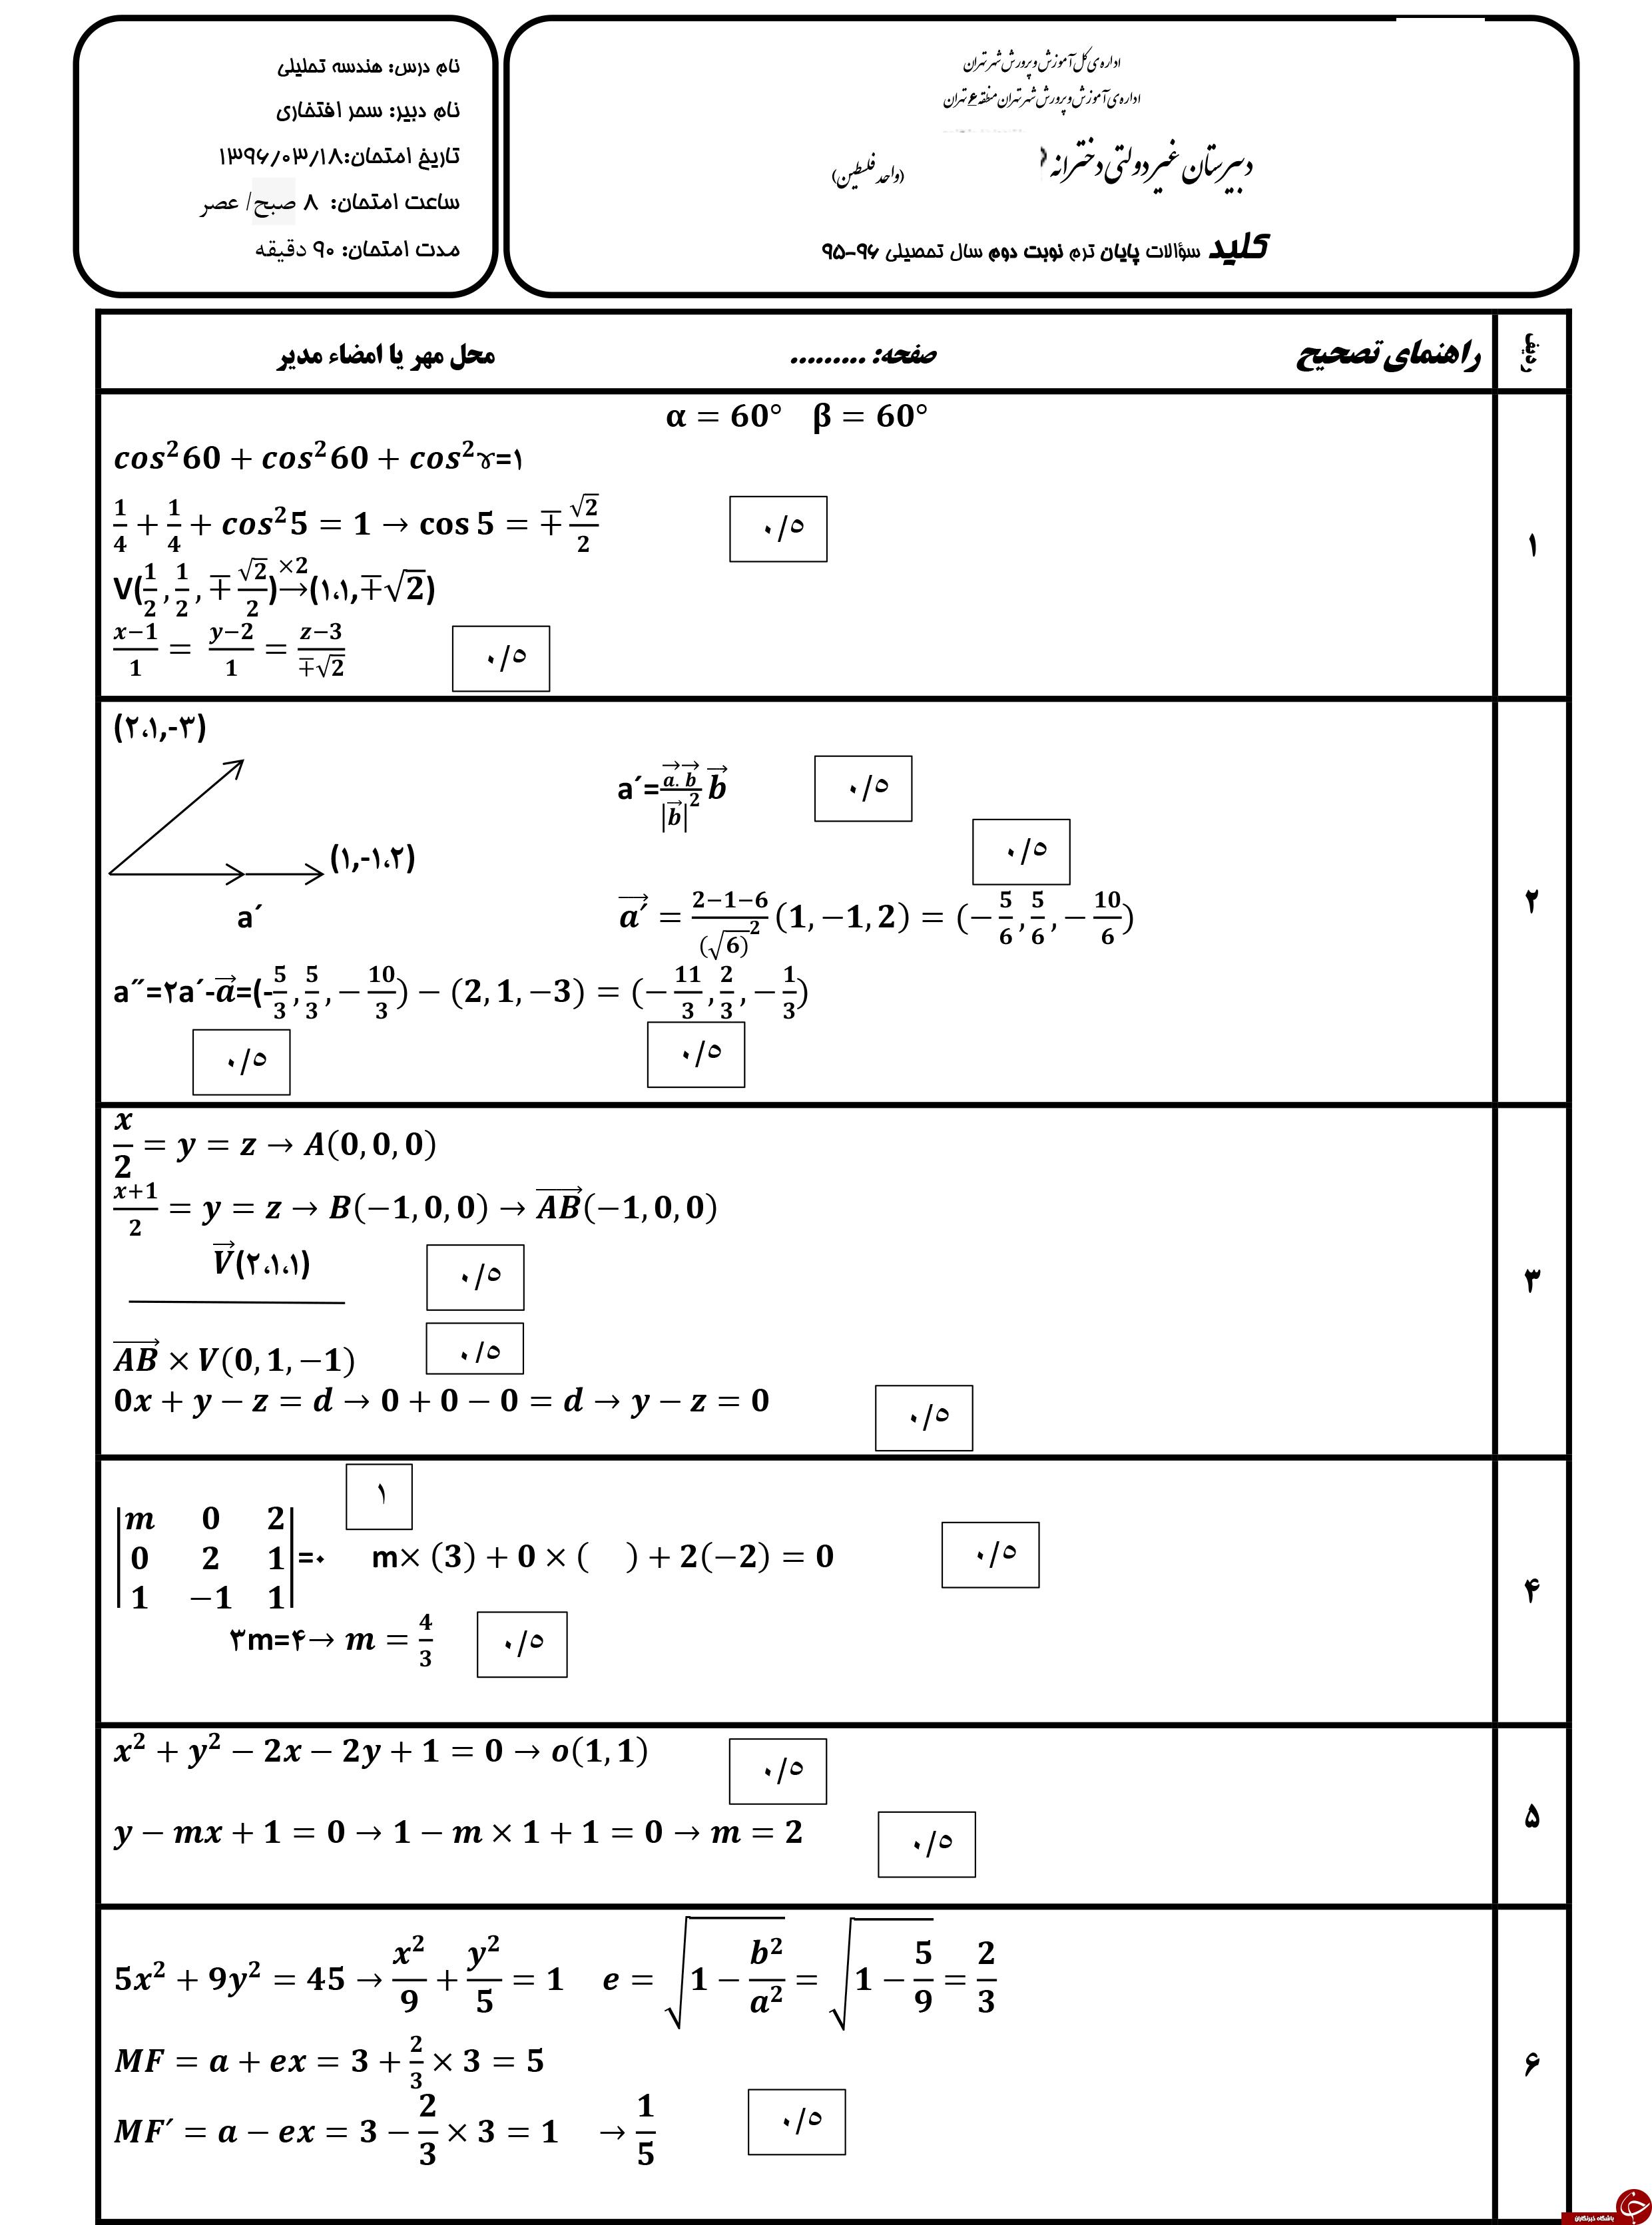 پر تکرار ترین نمونه سوالات نمونه سوالات هندسه ترم دوم + تصاویر